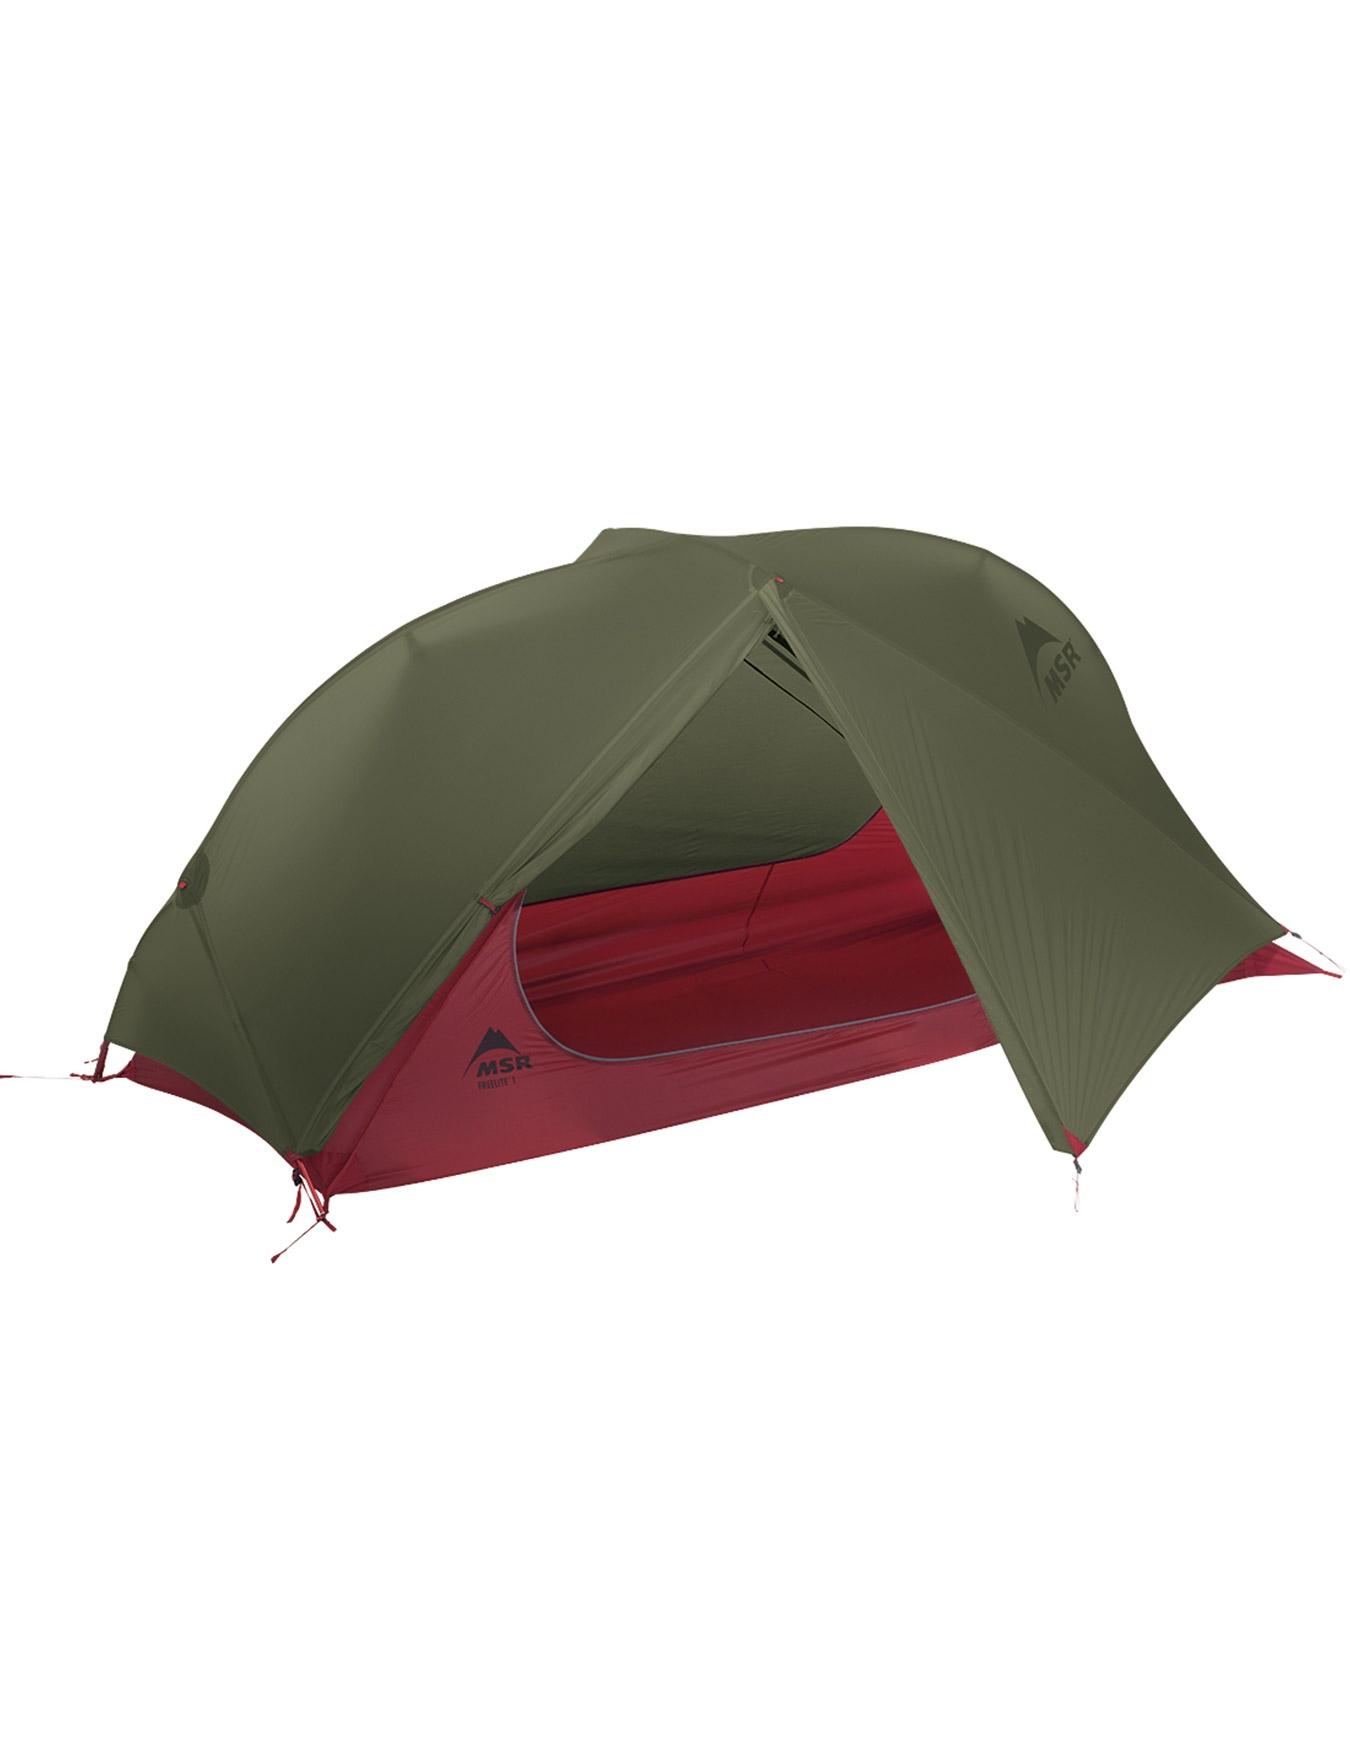 Tente MSR FreeLite 1 V2